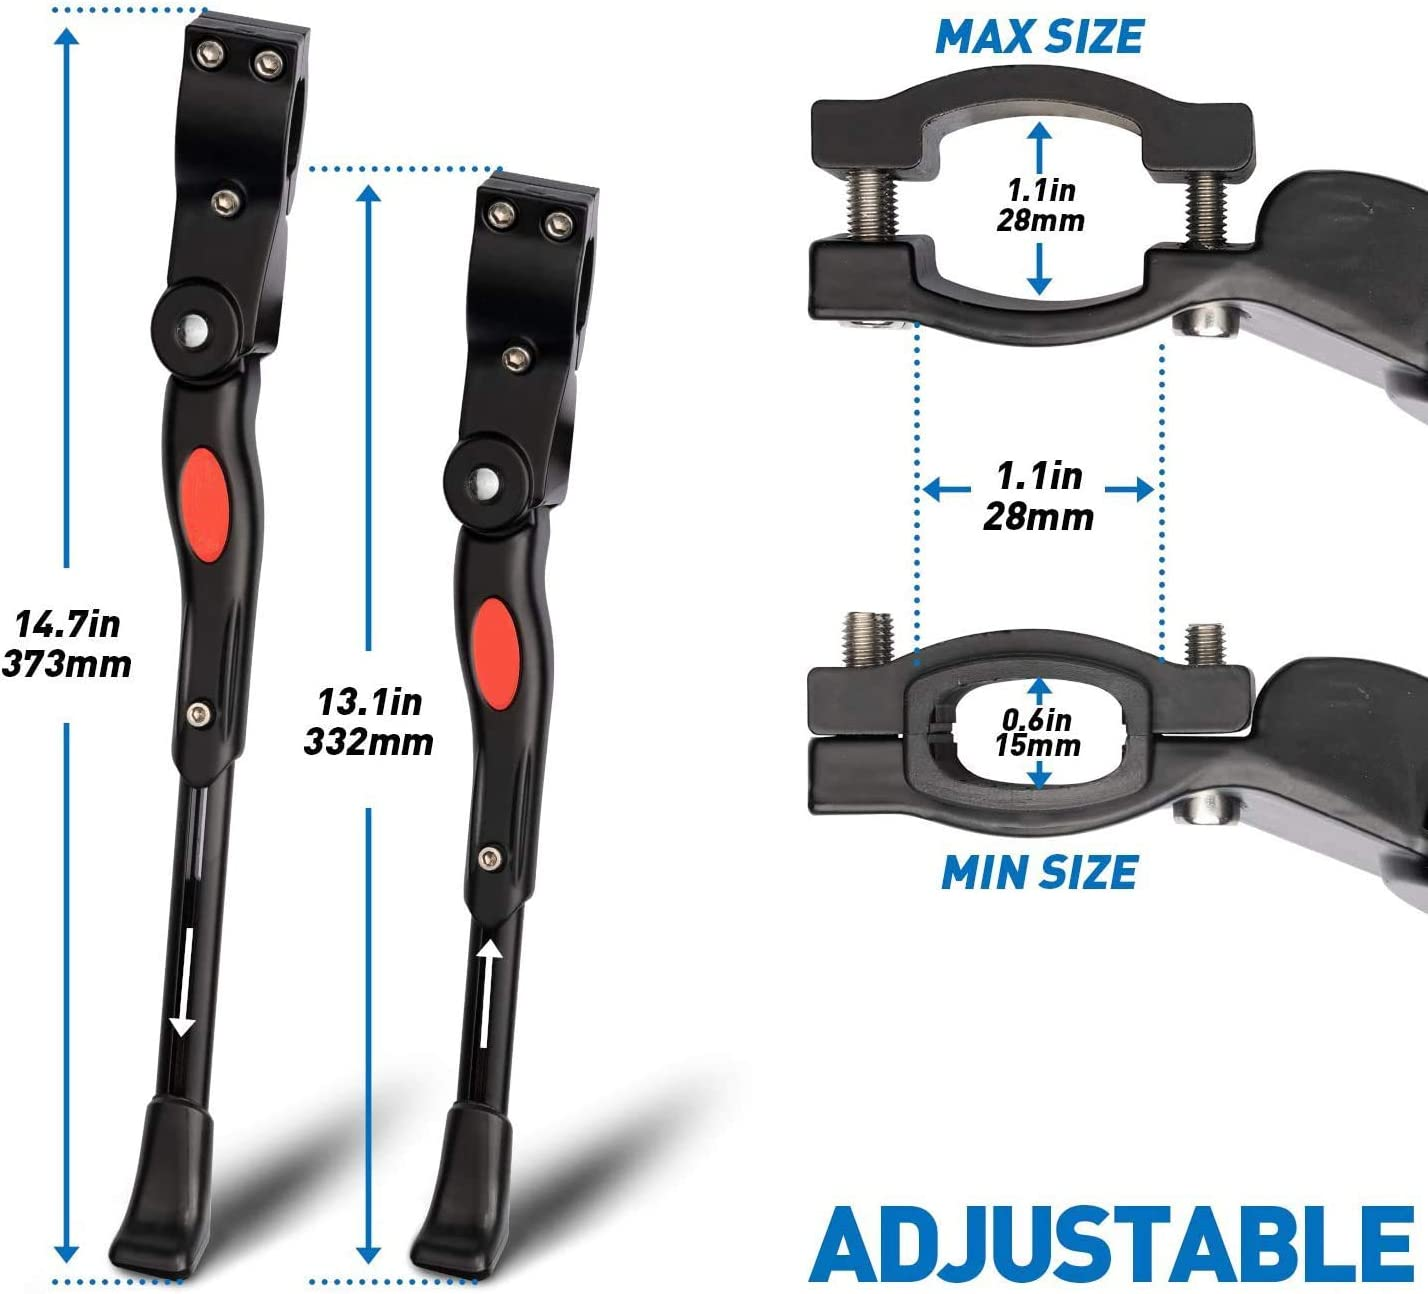 Timebox Bike Kickstand Adjustable Universal Aluminium Bicycle Kickstand Fit for 22 24 26 28 Mountain Bike//700 Road Bike//BMX//MTB